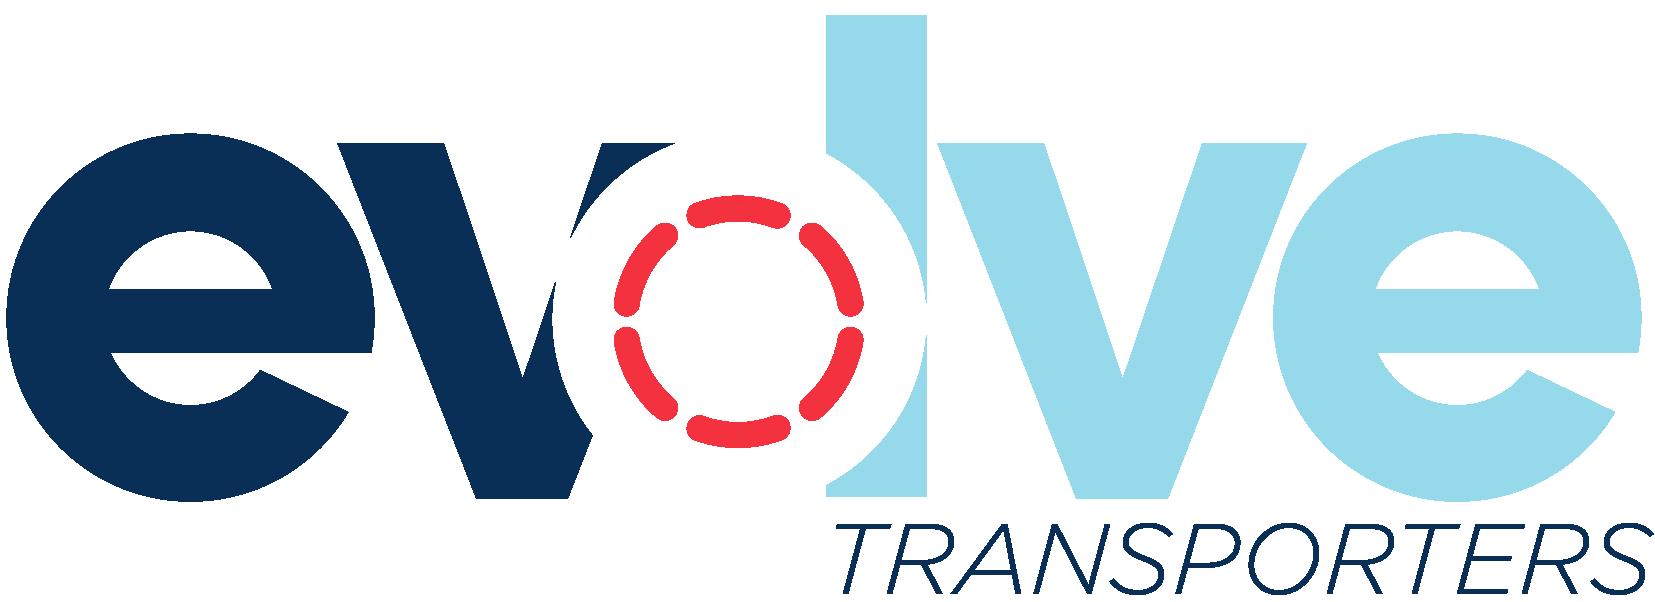 Evolve Transporters